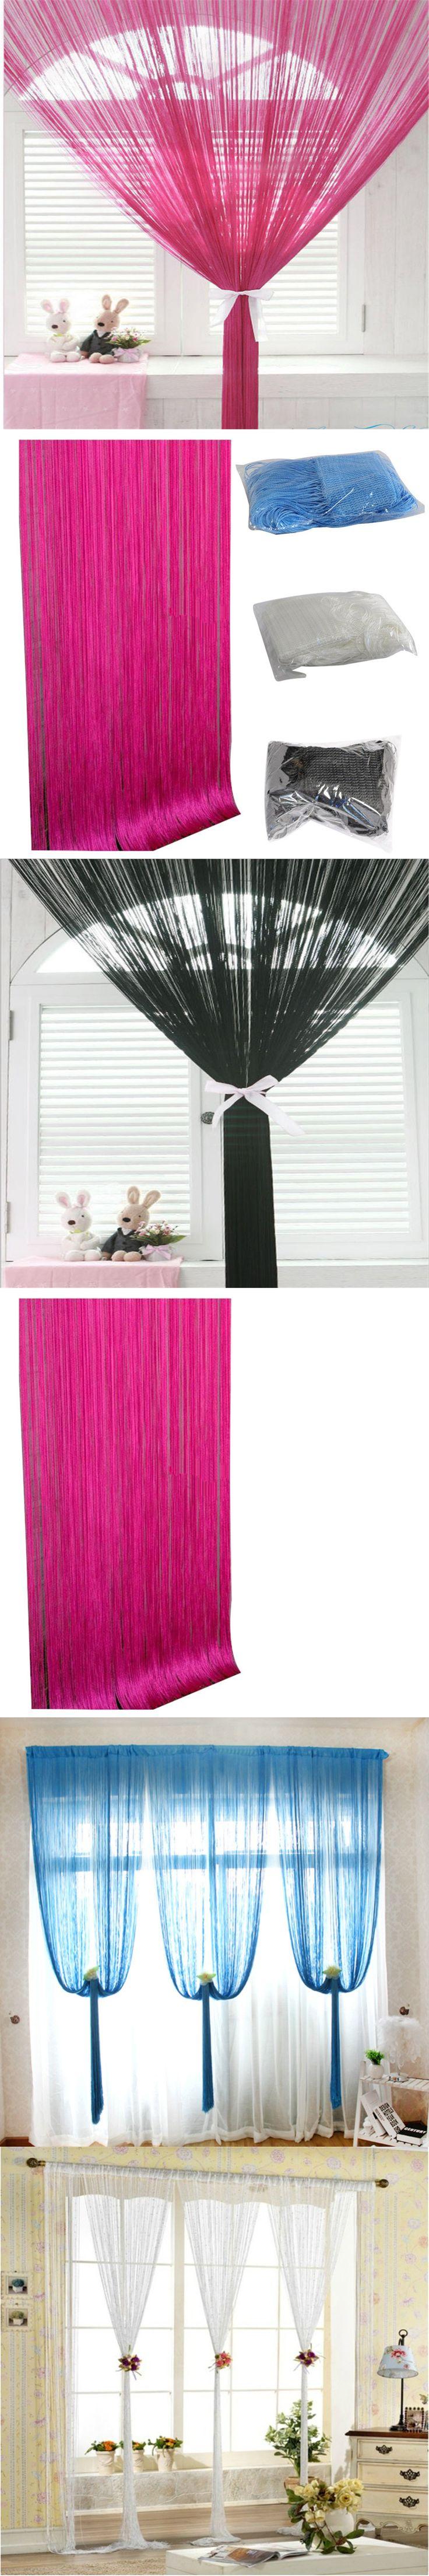 Special Line tassel string curtain 100 * 200cm drape purdah interior Valance curtains decorative French Window upscale hotel $8.2